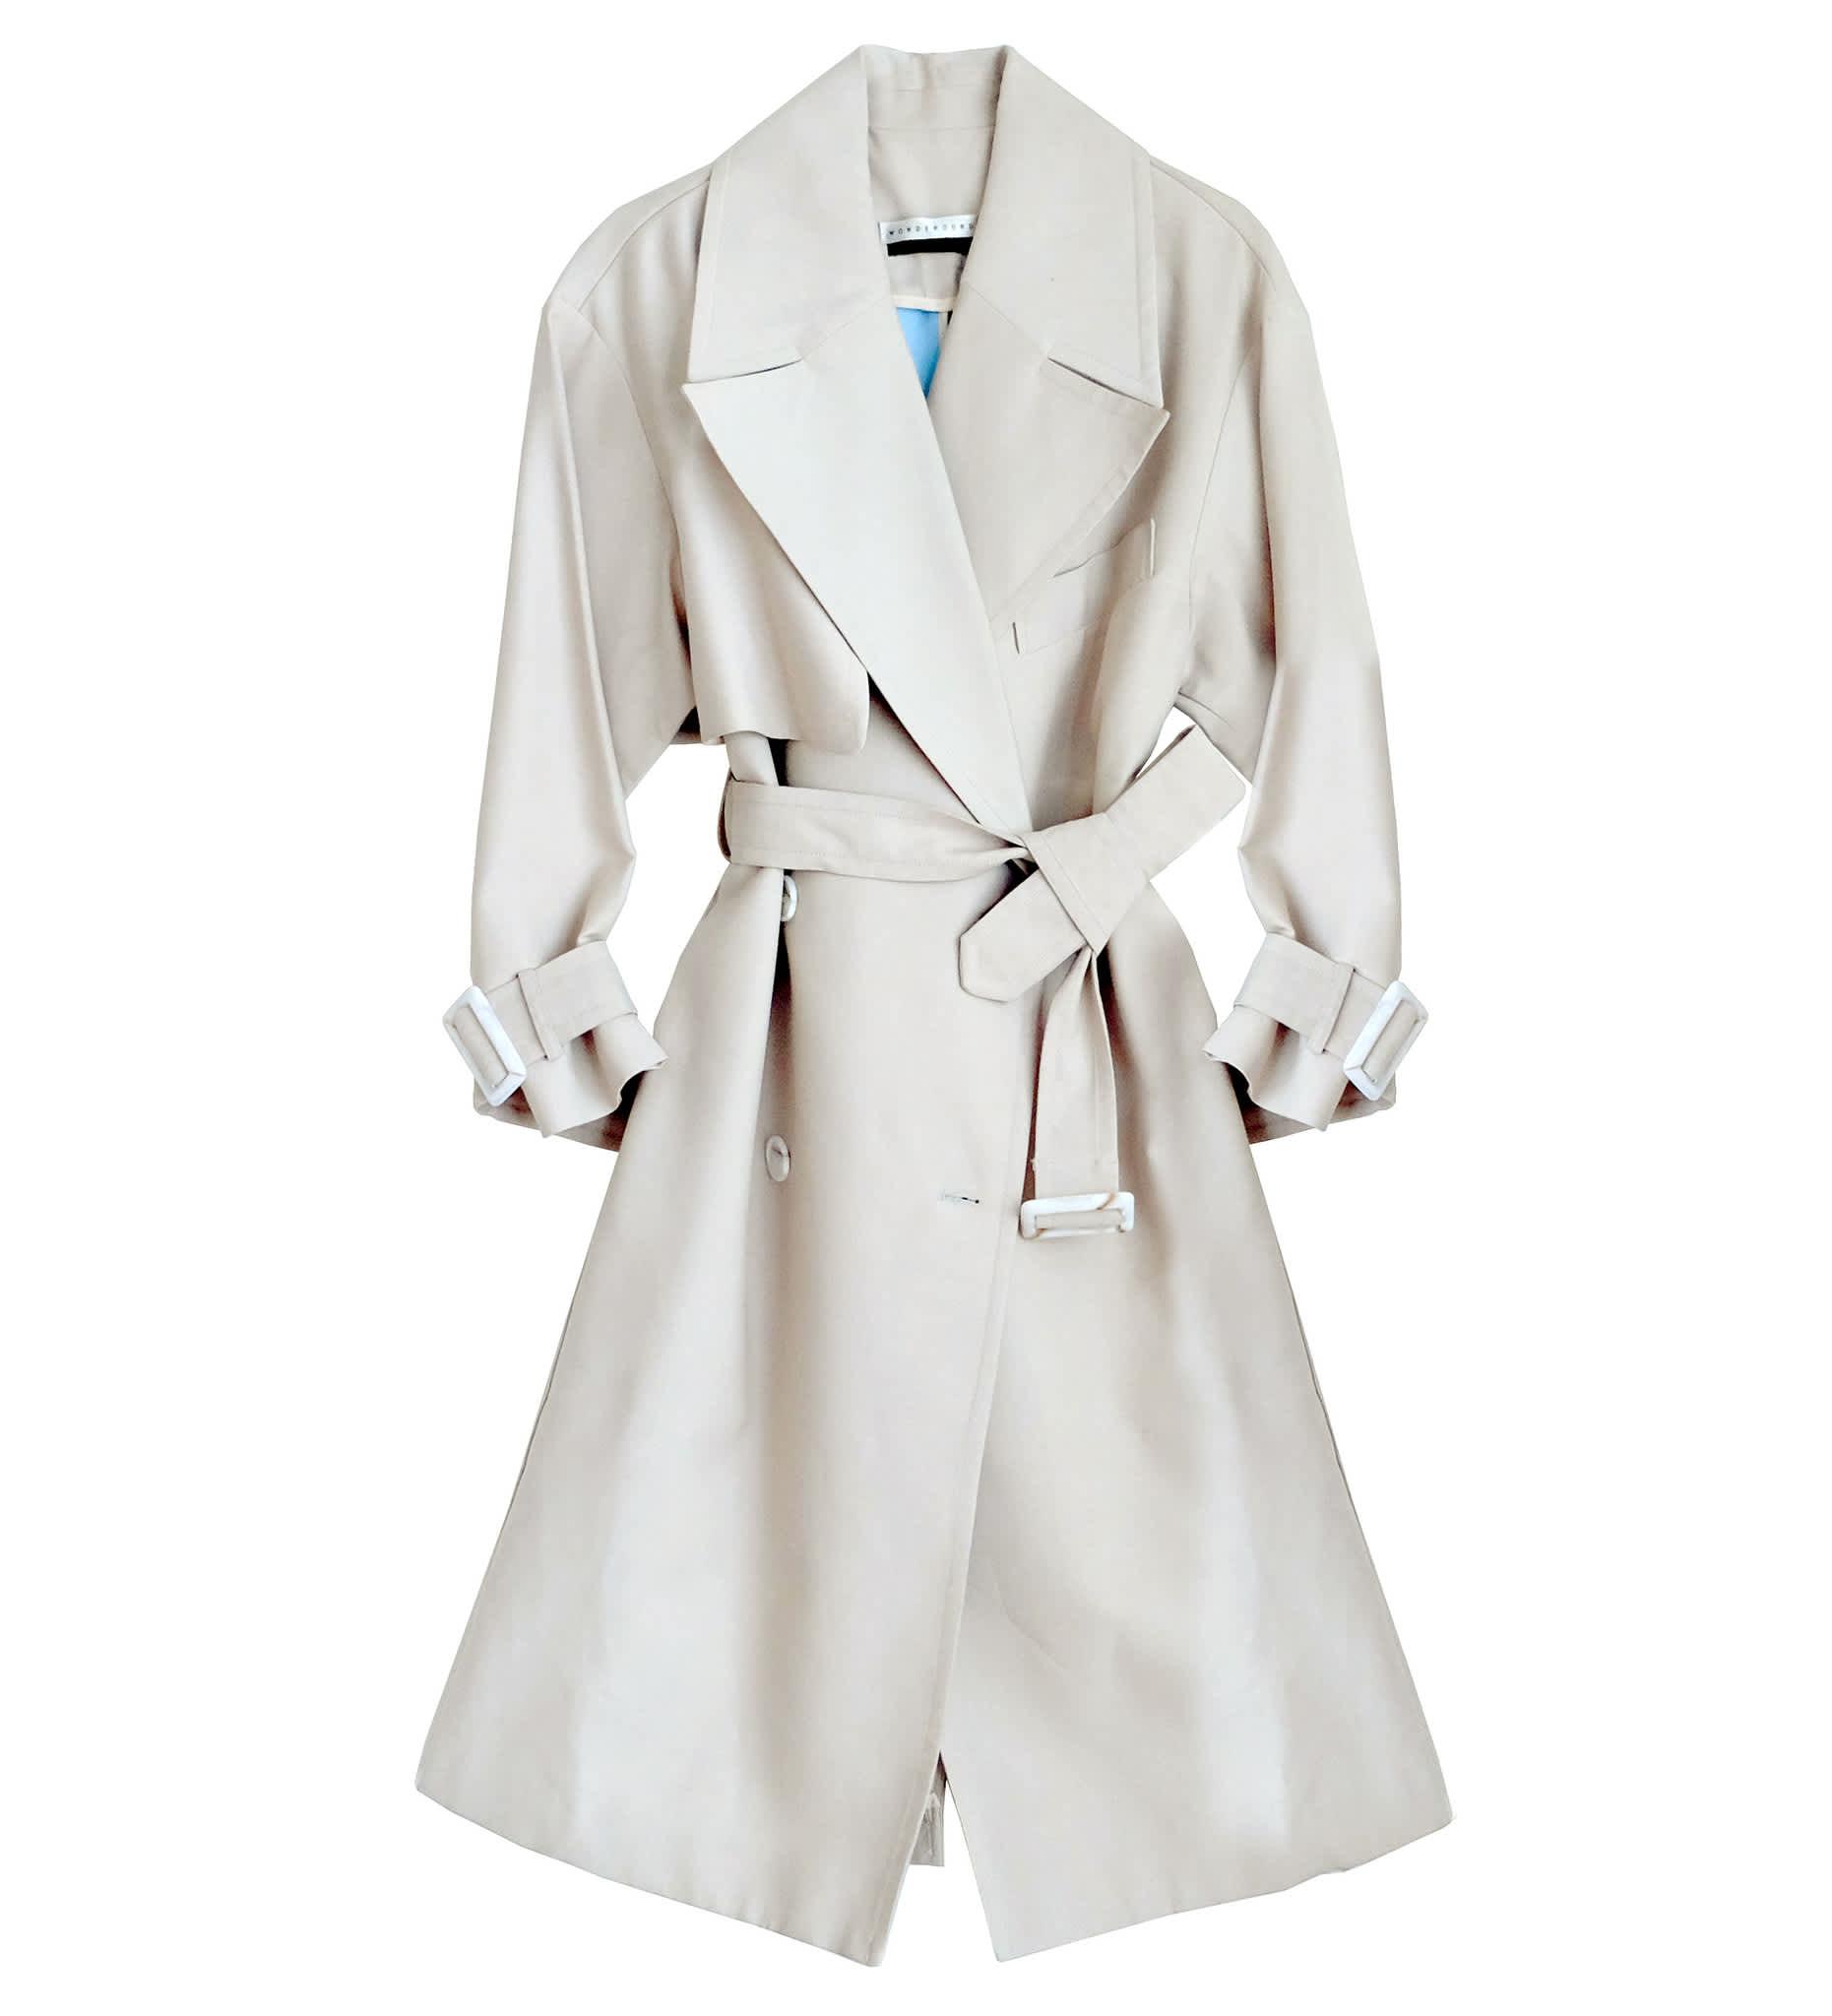 Wonderound Spring Trench Coat